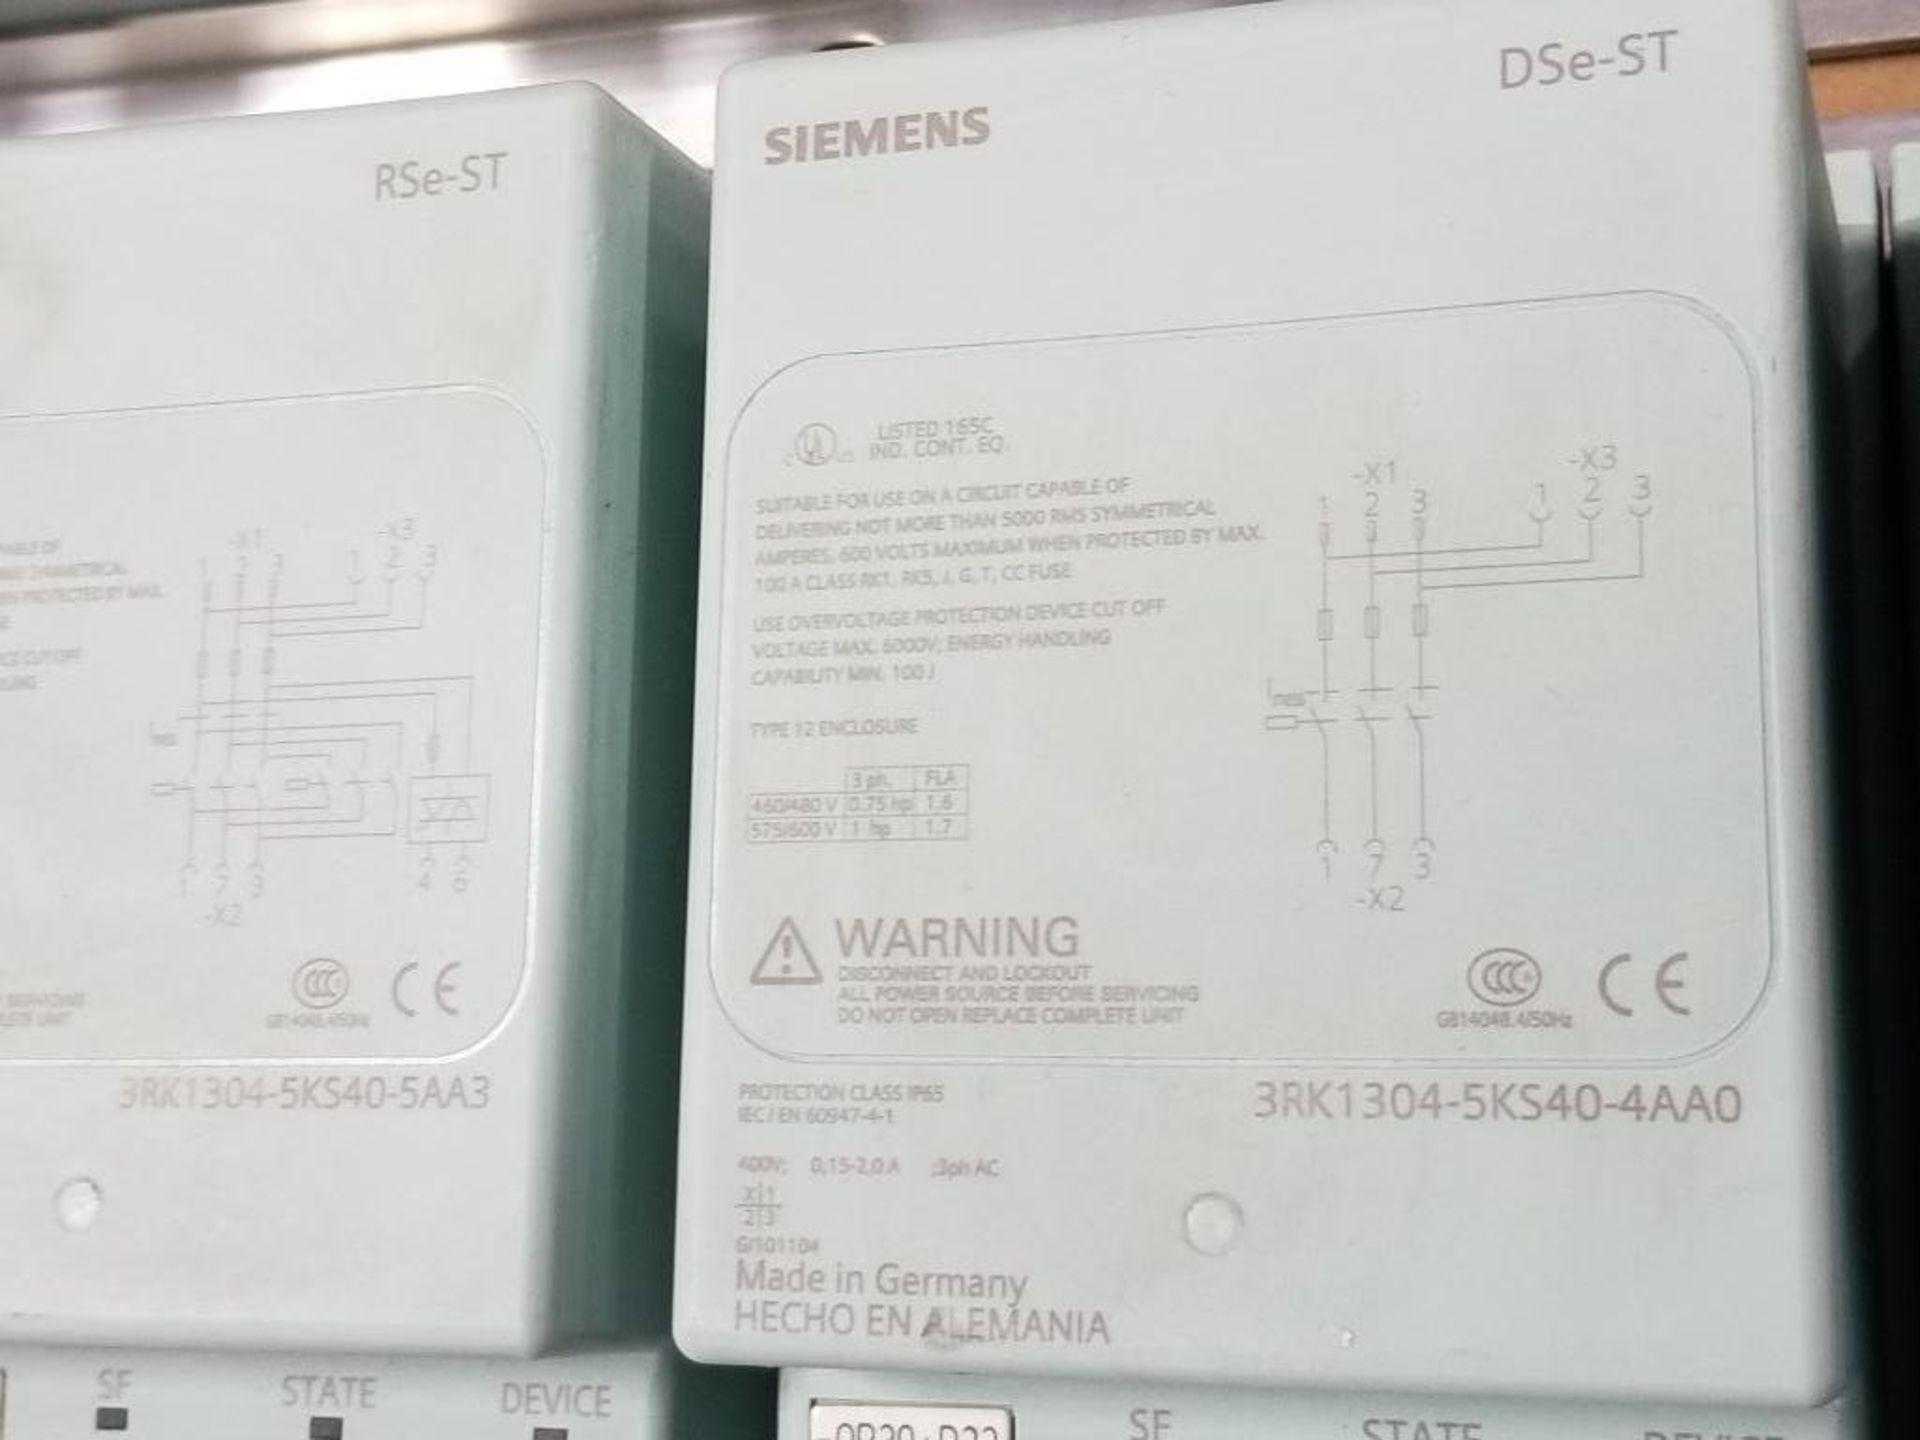 Siemens RSe-ST Reversing starter, DSe-ST Disconnect module flow control line. - Image 3 of 9